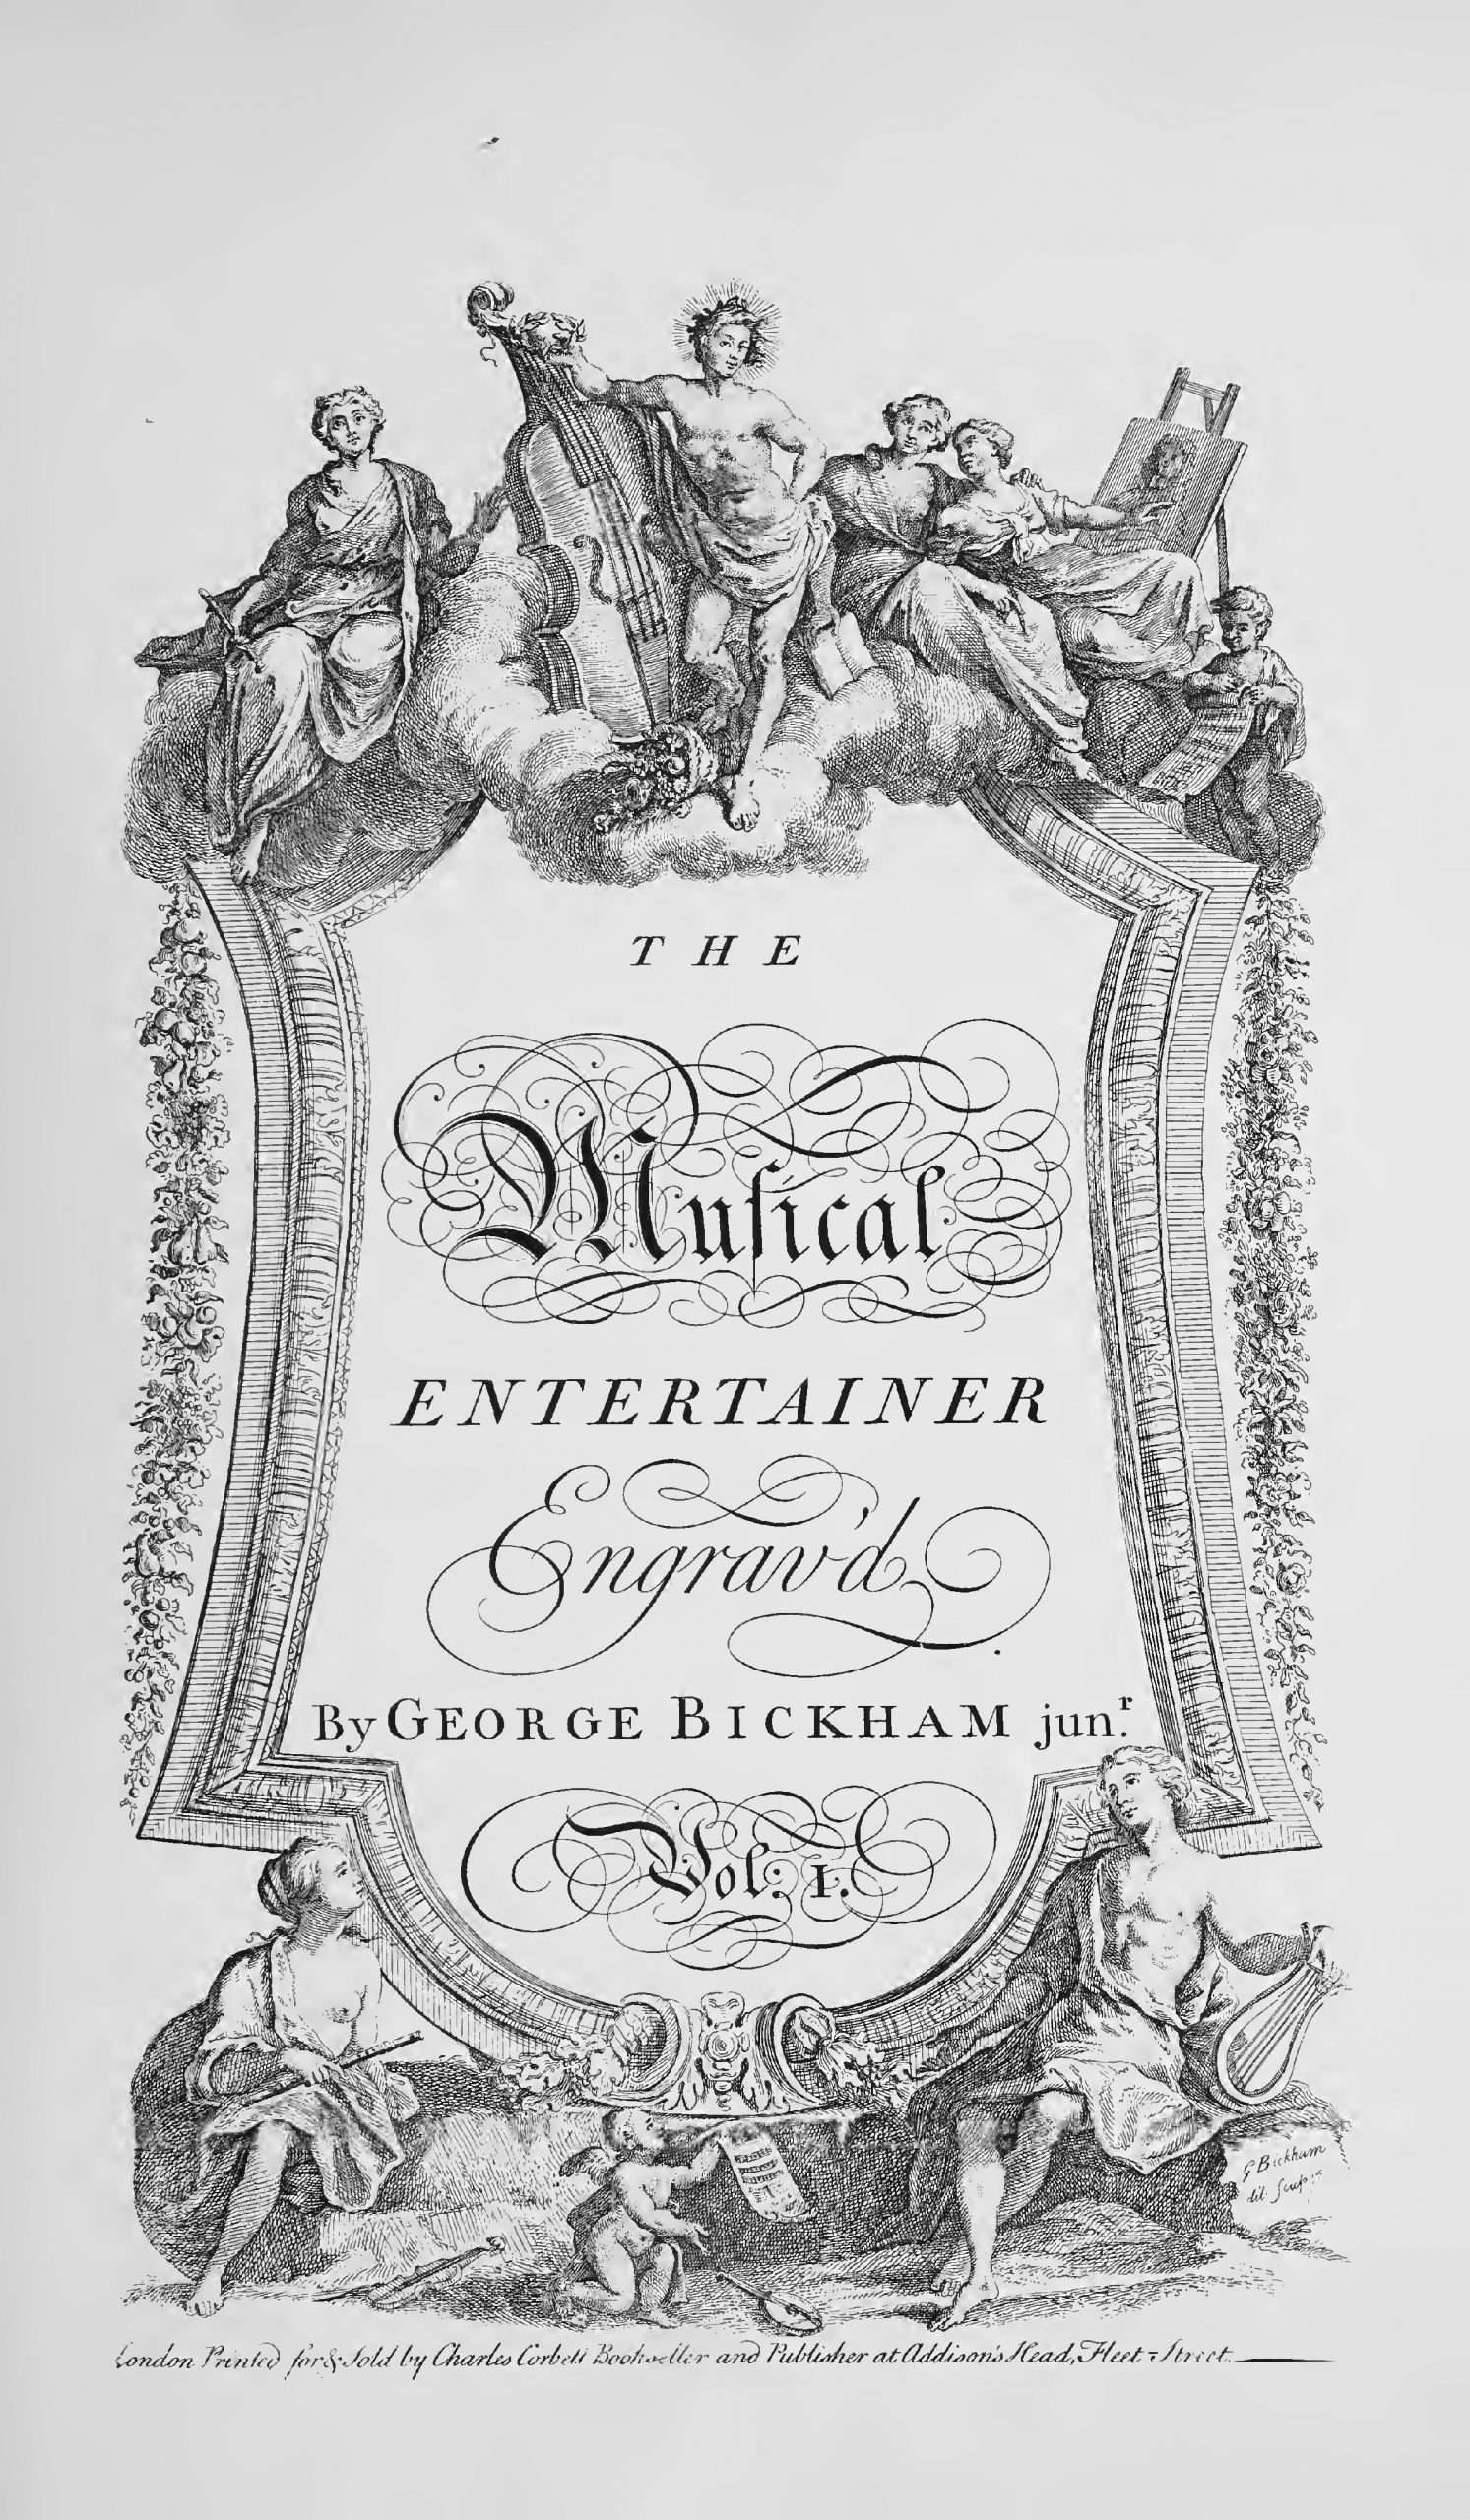 Bickham Jr., George - The Musical Entertainer (Vol.1)